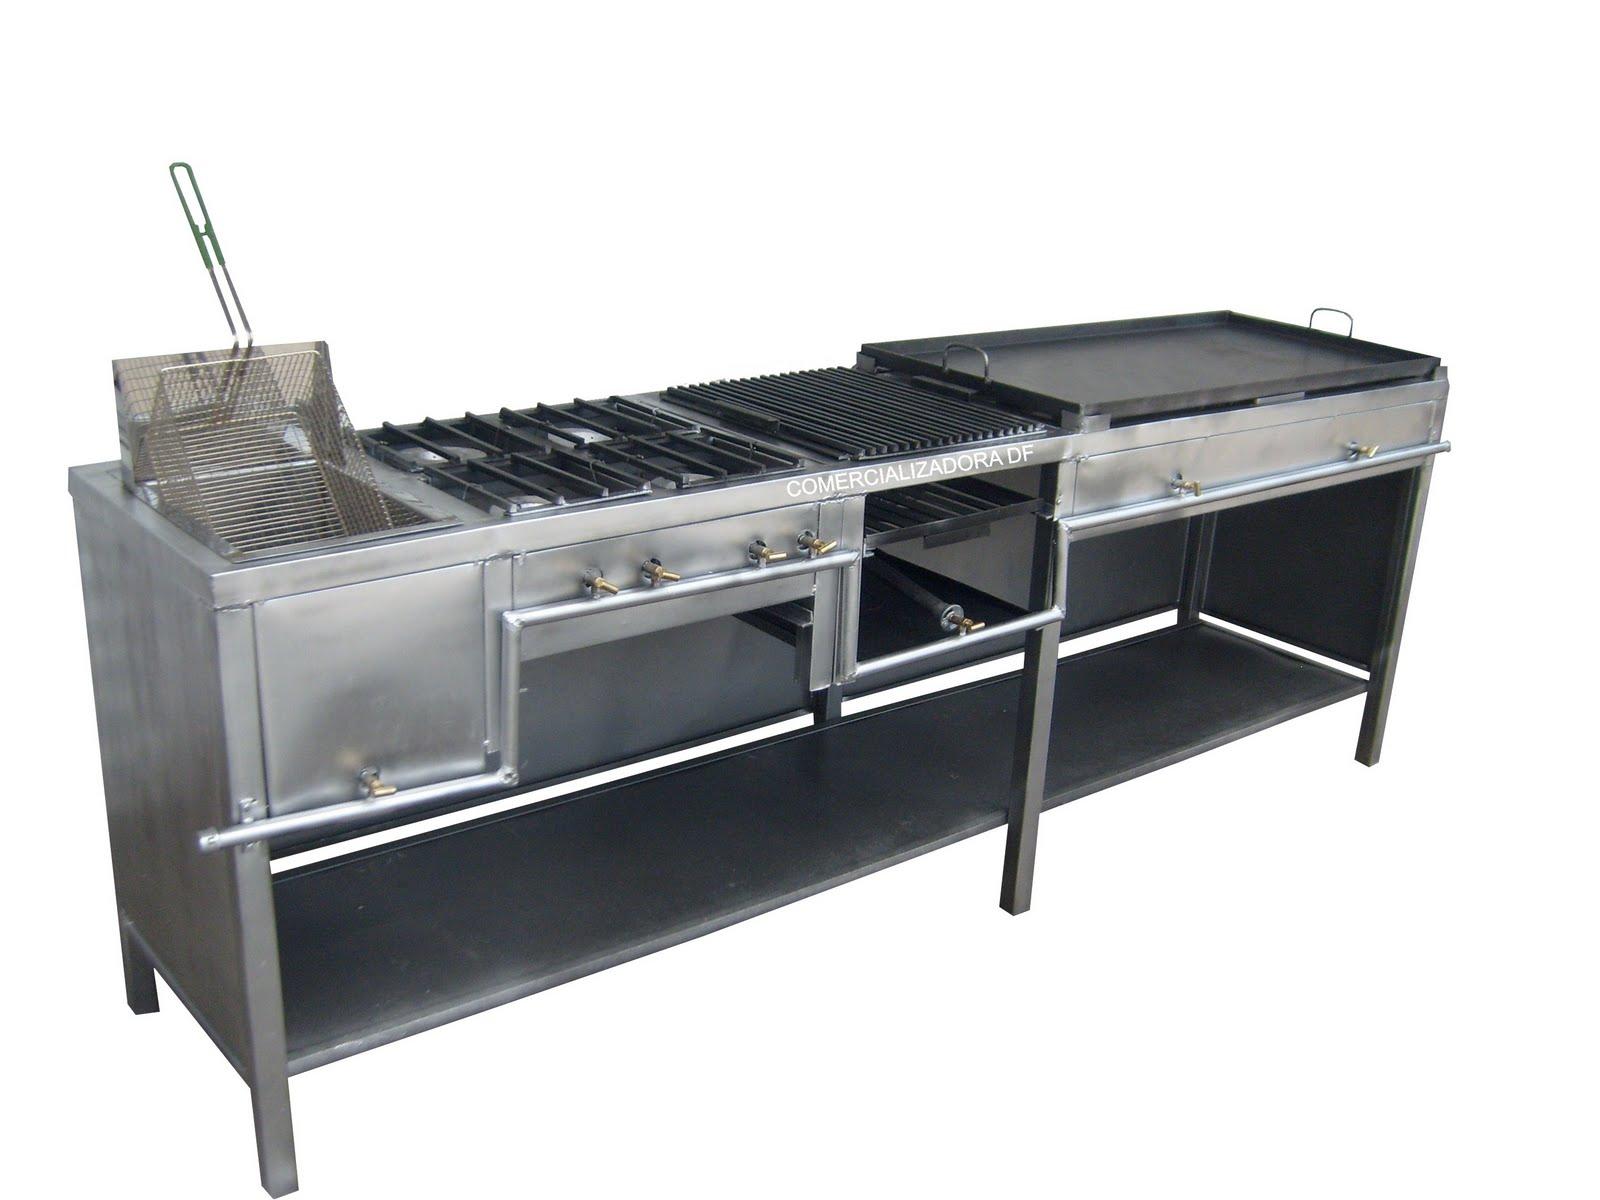 Freidora estufa con 4 hornillas asador y plancha 4 en 1 for Planchas para forrar banos